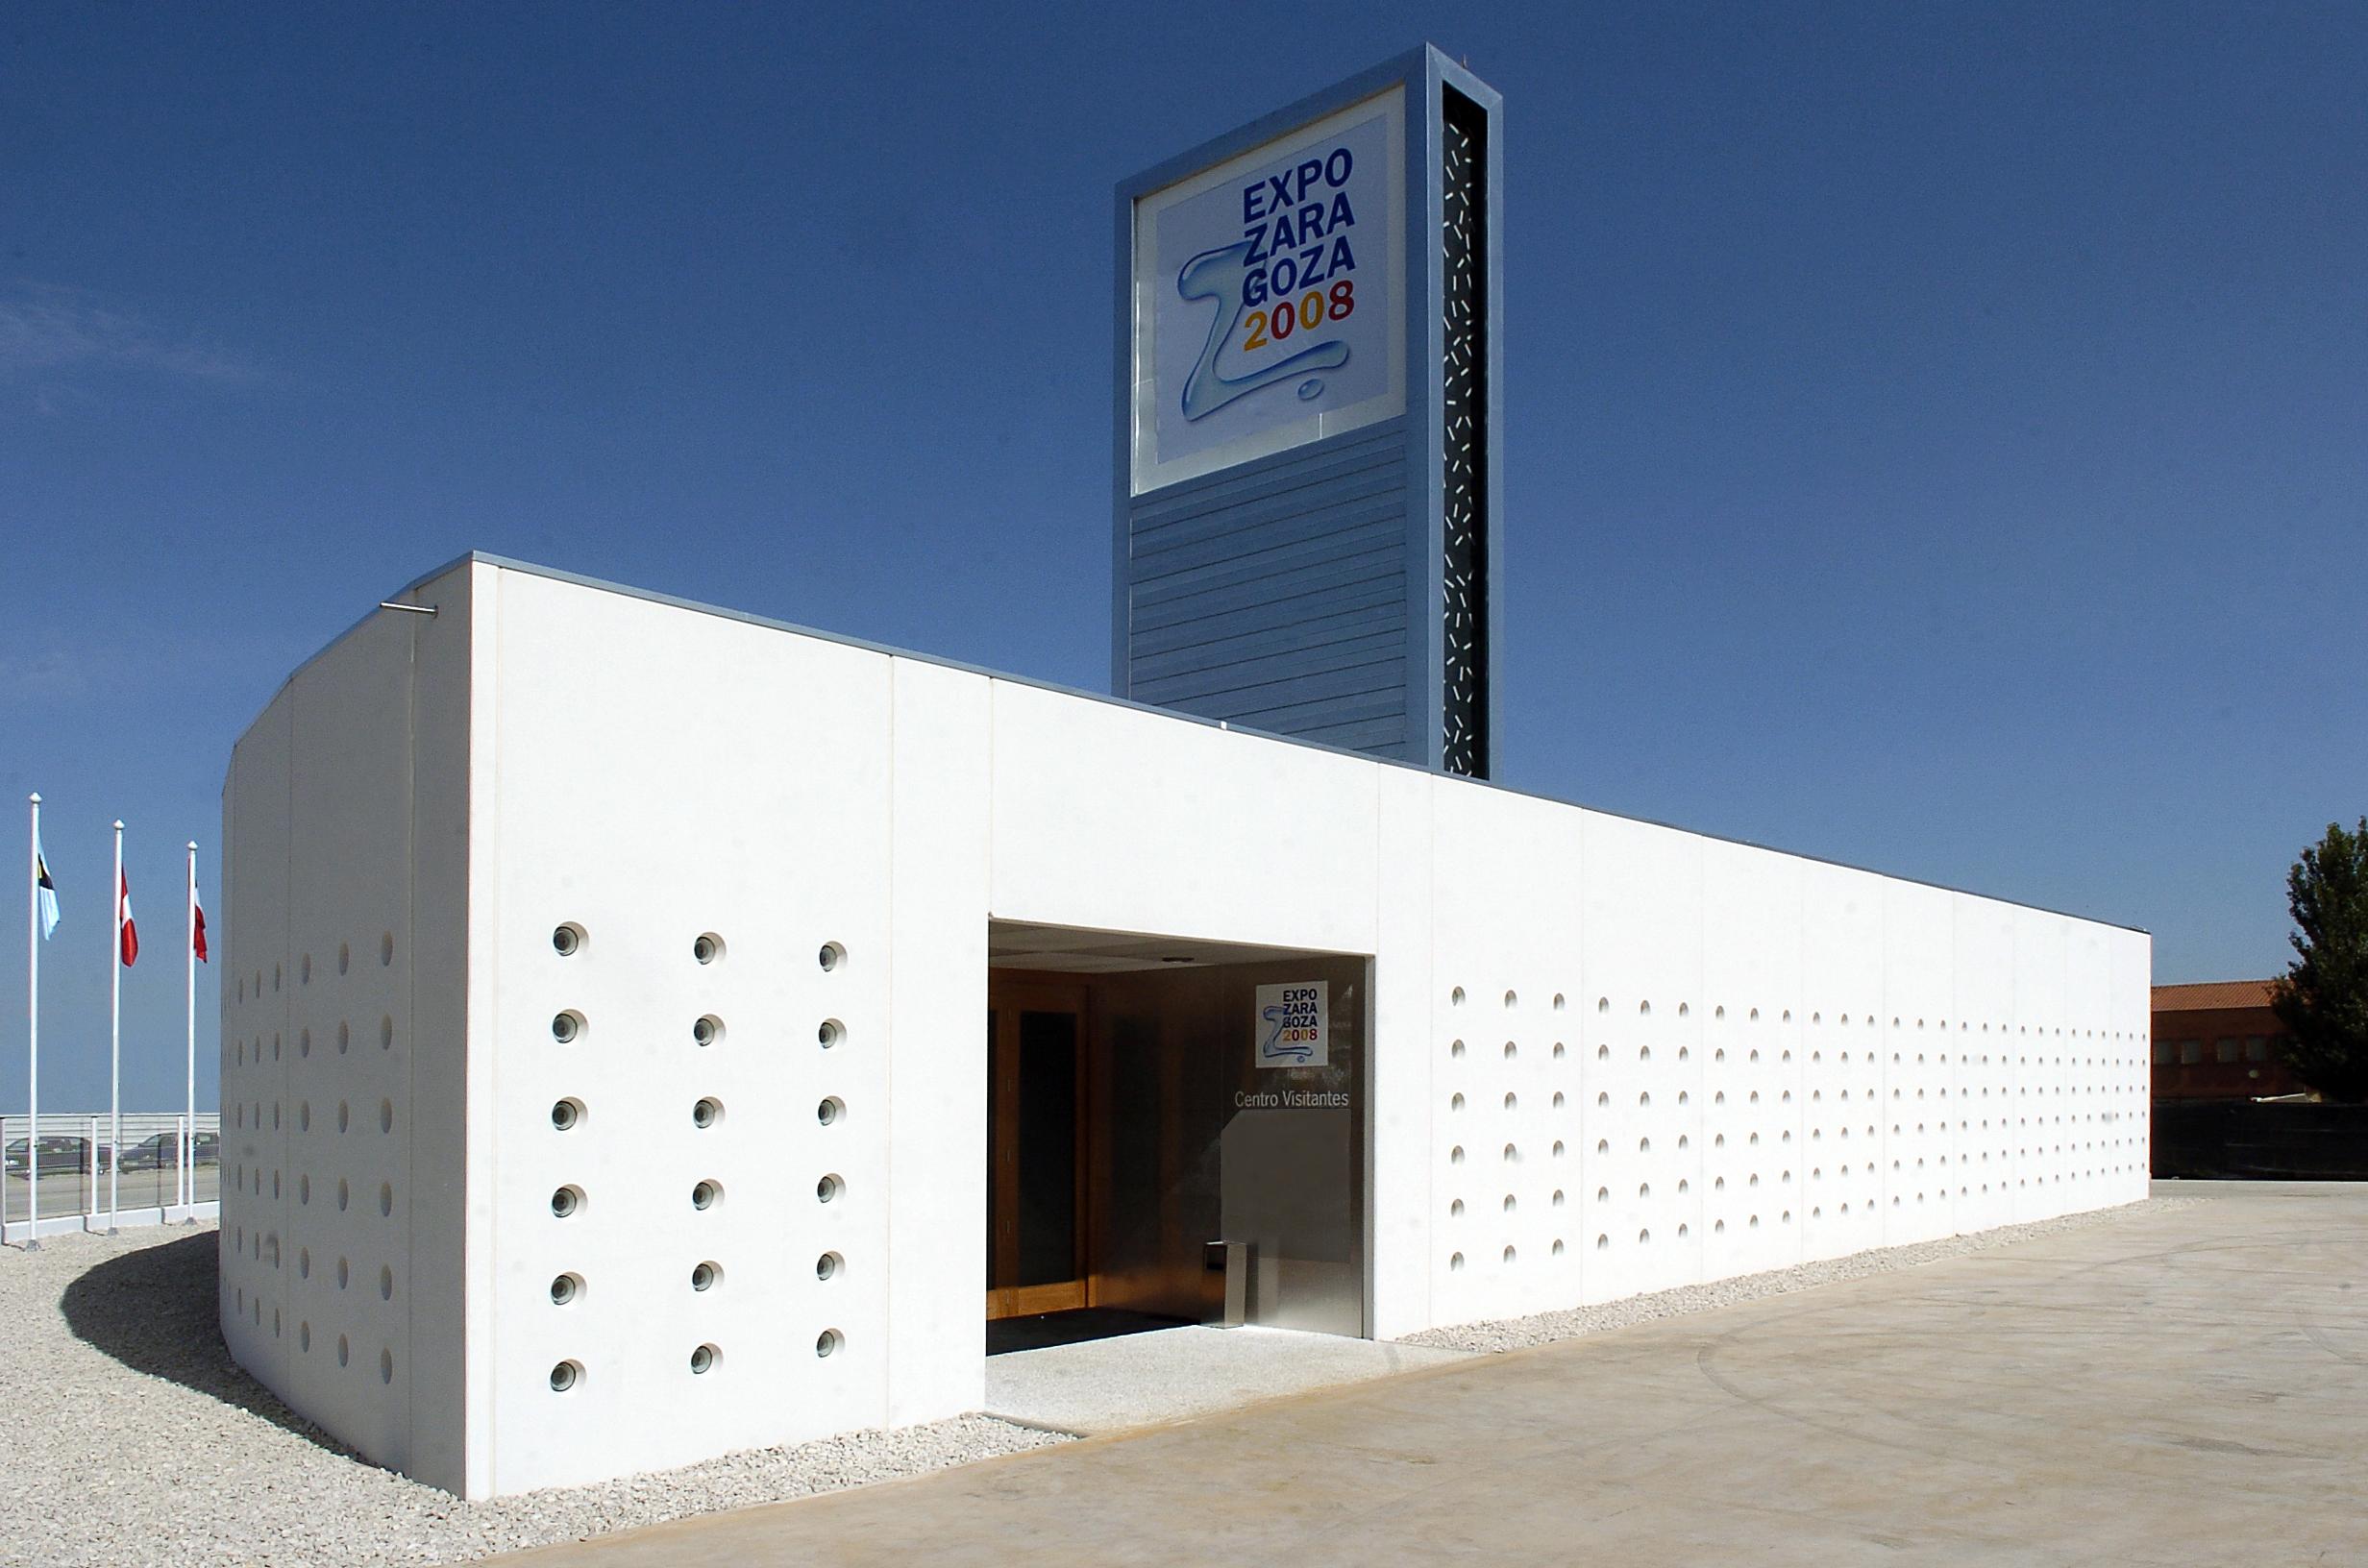 Centro Visitantes EXPO 2008